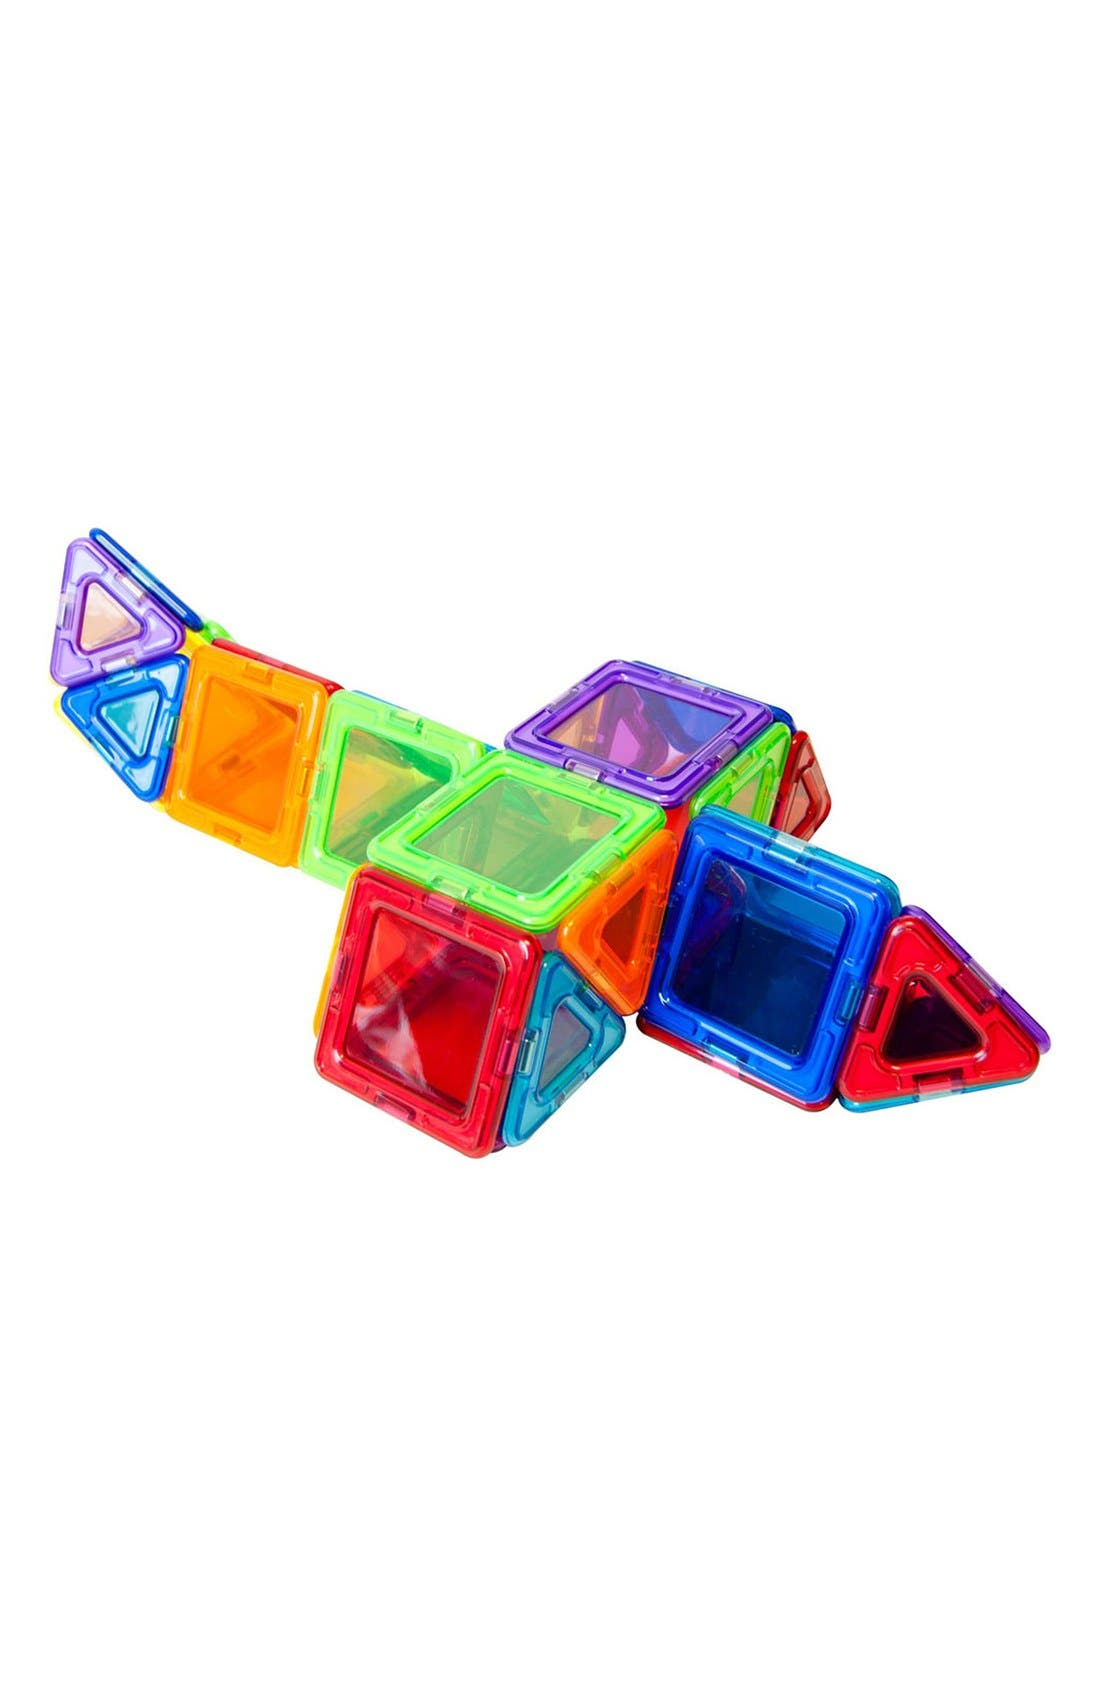 'Standard - Solids' Clear Magnetic 3D Construction Set,                             Alternate thumbnail 6, color,                             Rainbow